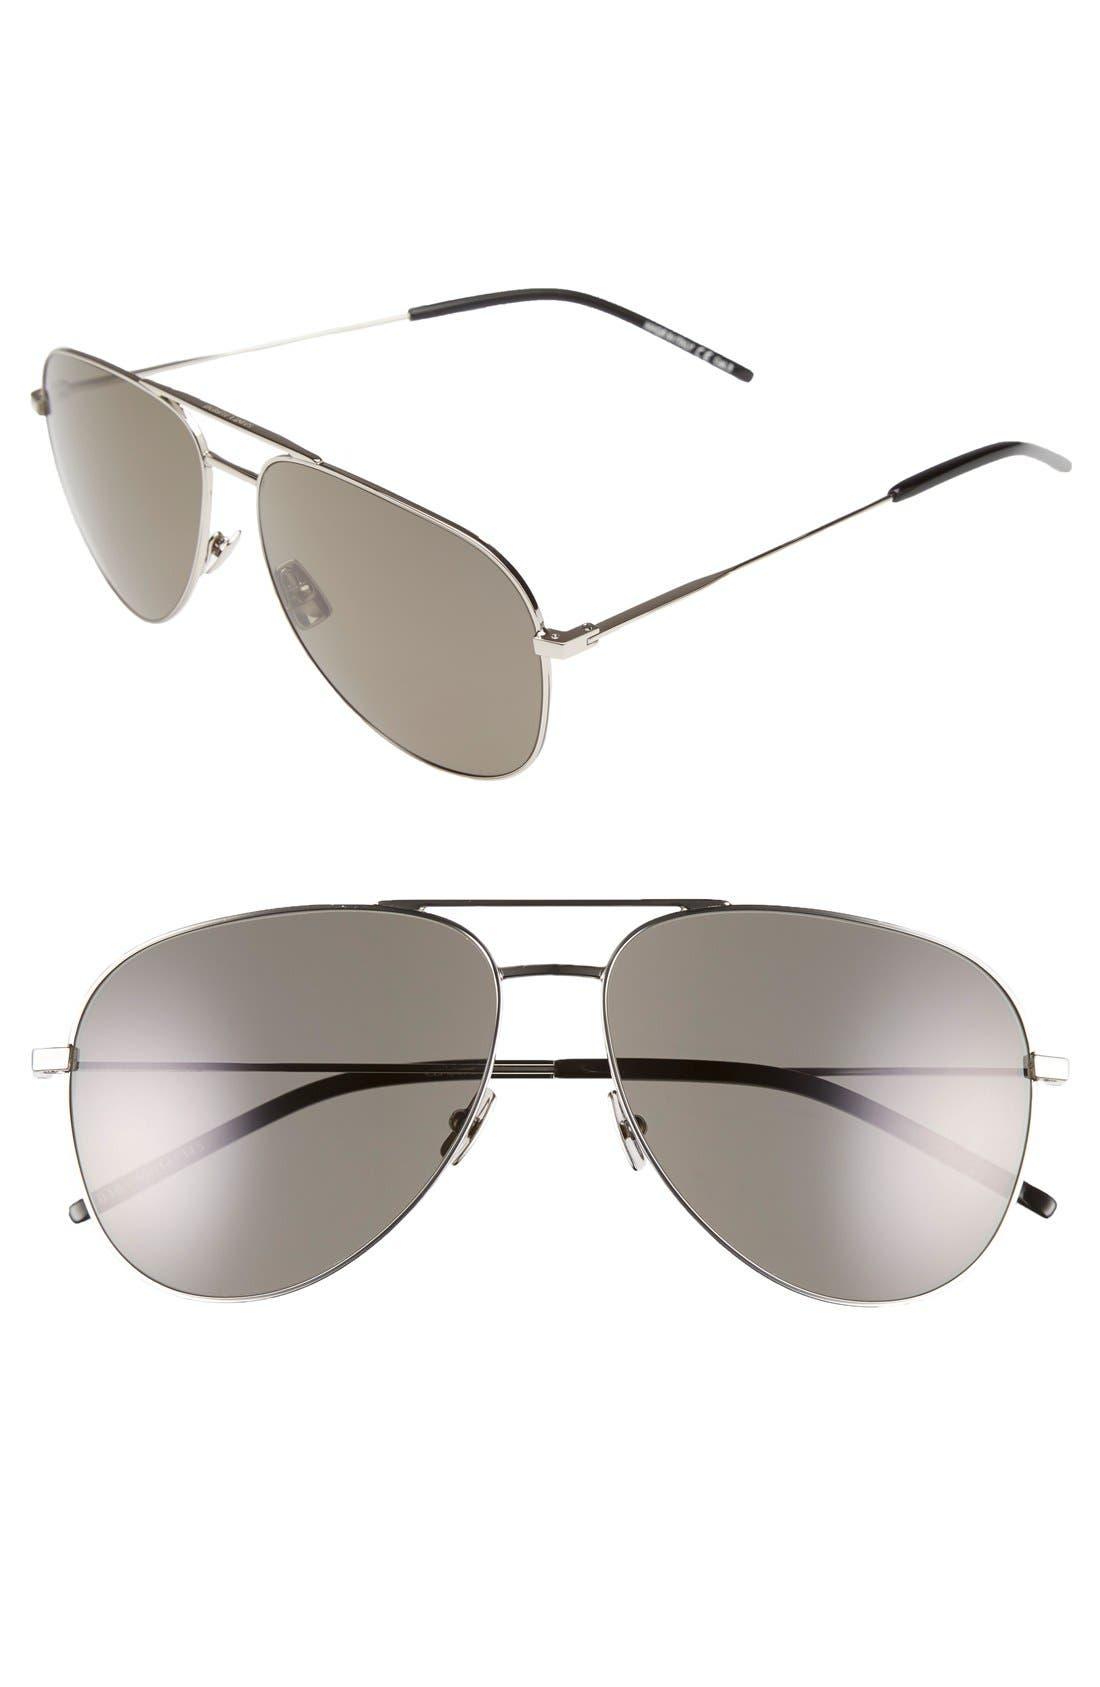 Alternate Image 1 Selected - Saint Laurent 'Classic' 59mm Aviator Sunglasses